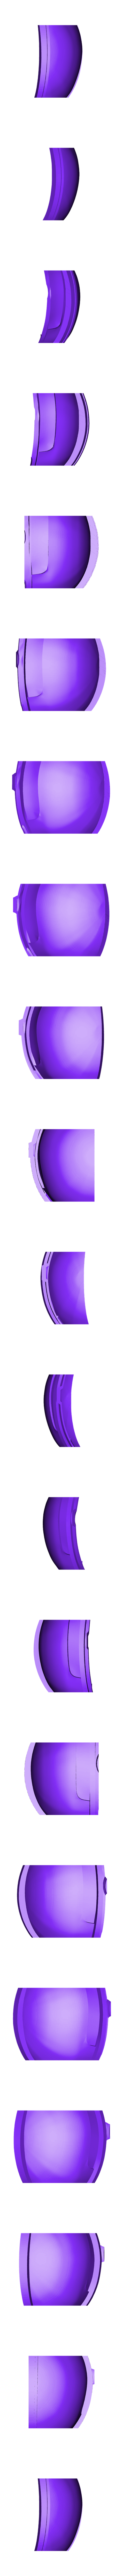 Part 11 v3.stl Download free STL file Clone Trooper Helmet Phase 2 Star Wars • 3D printable template, VillainousPropShop